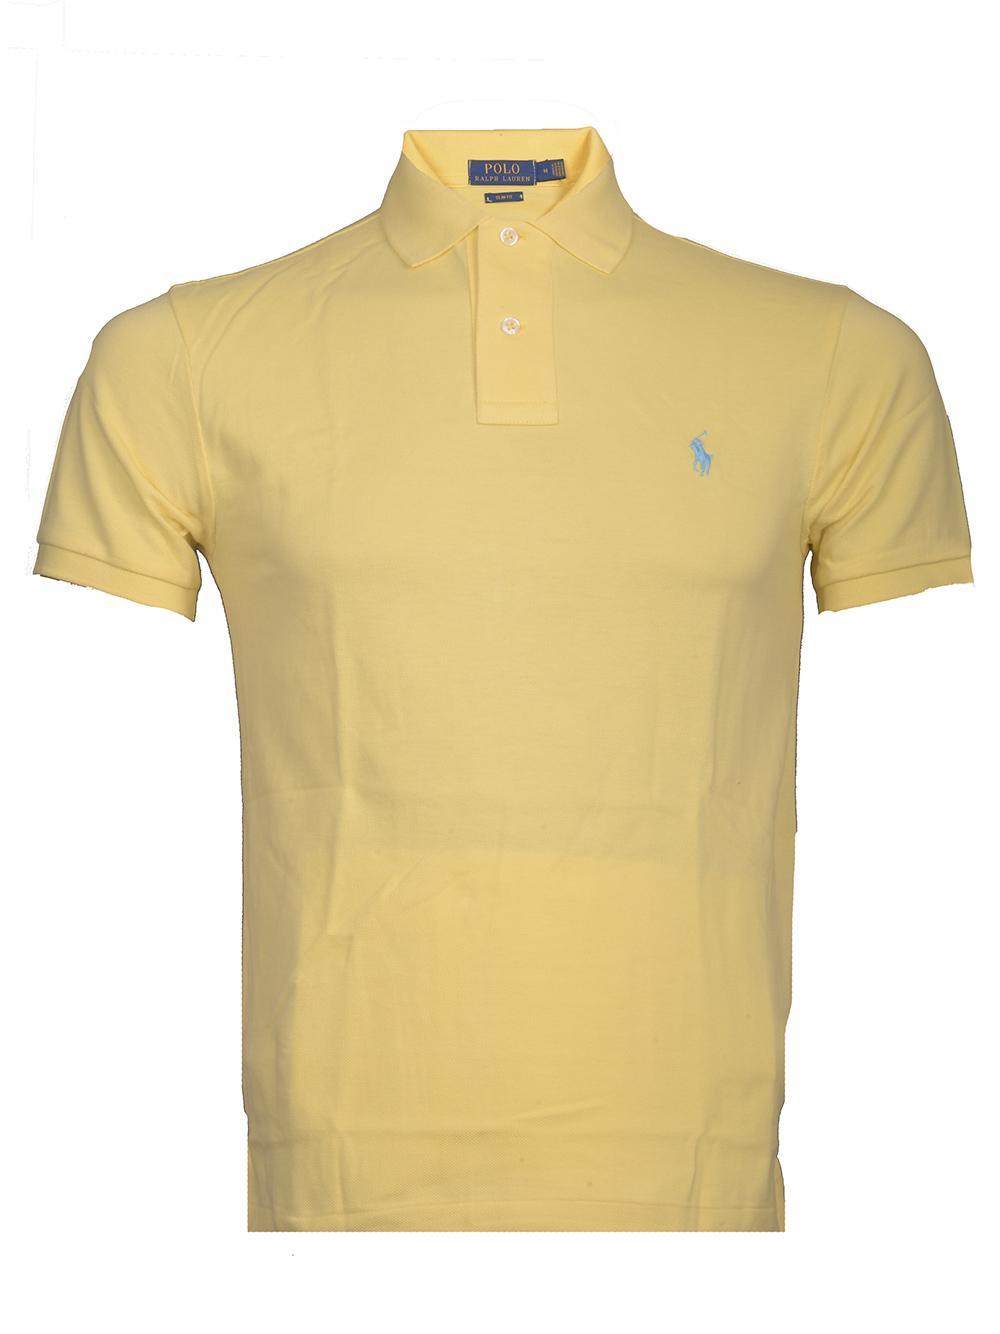 POLO RALPH LAUREN Μπλούζα Polo 710536856132 ΚΙΤΡΙΝΟ